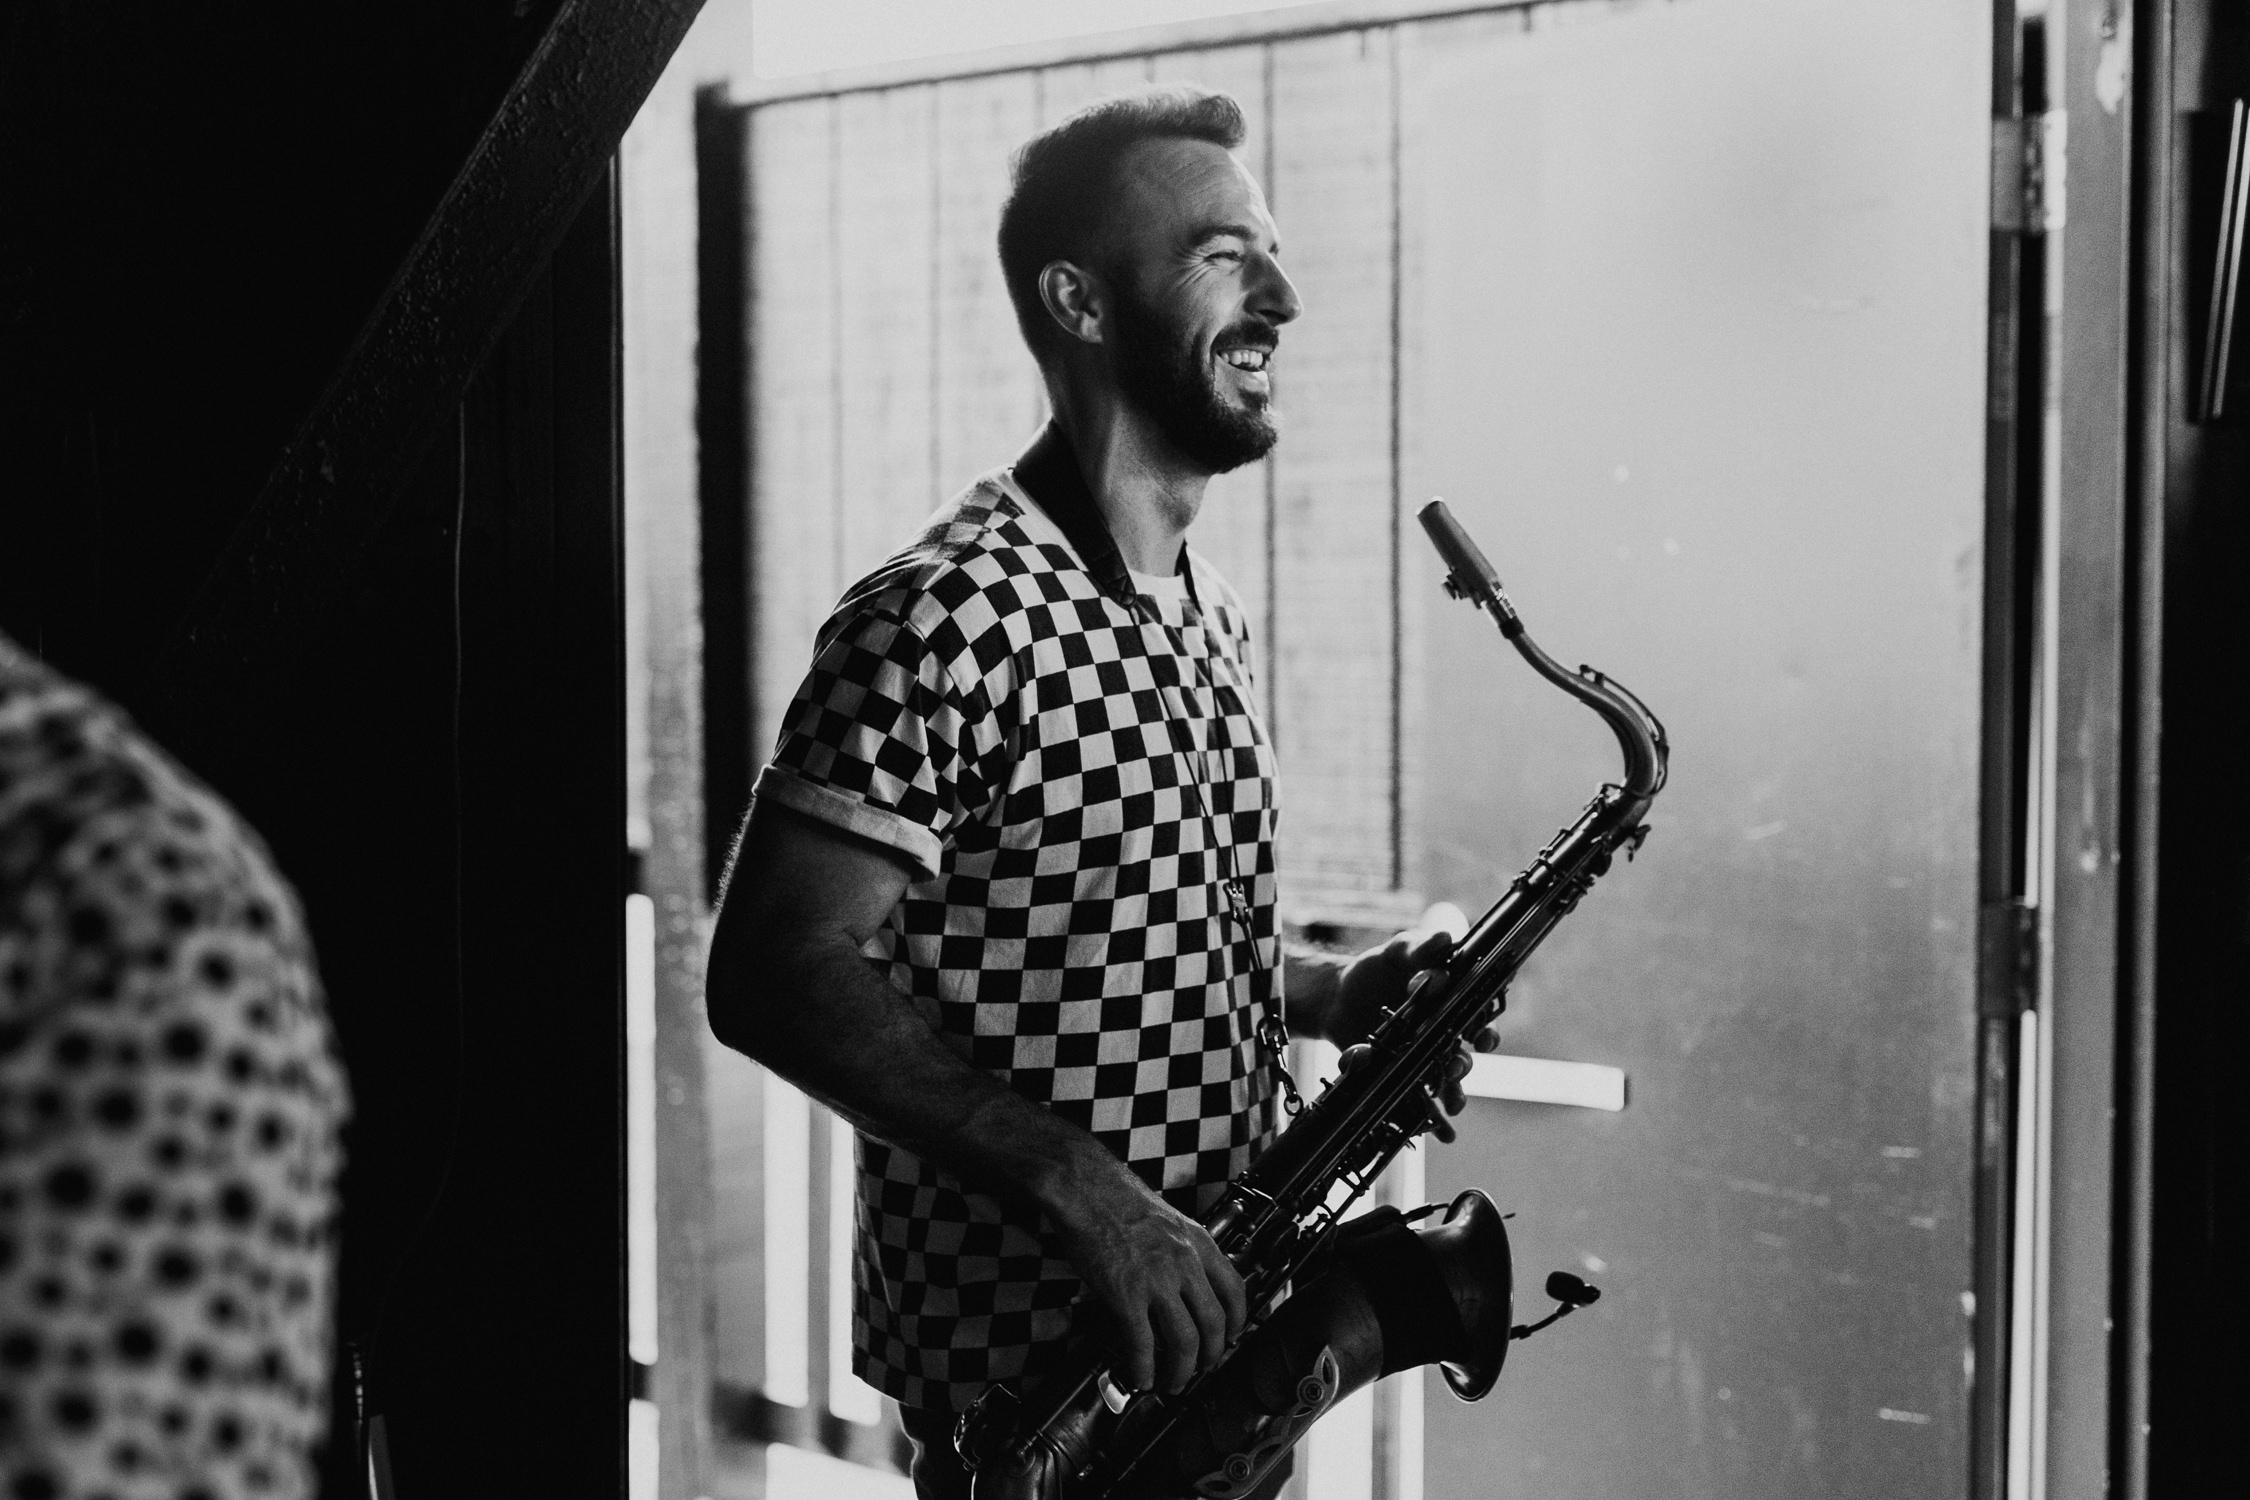 murph-sax-laughing-backstage-tour-AnnaLeeMedia